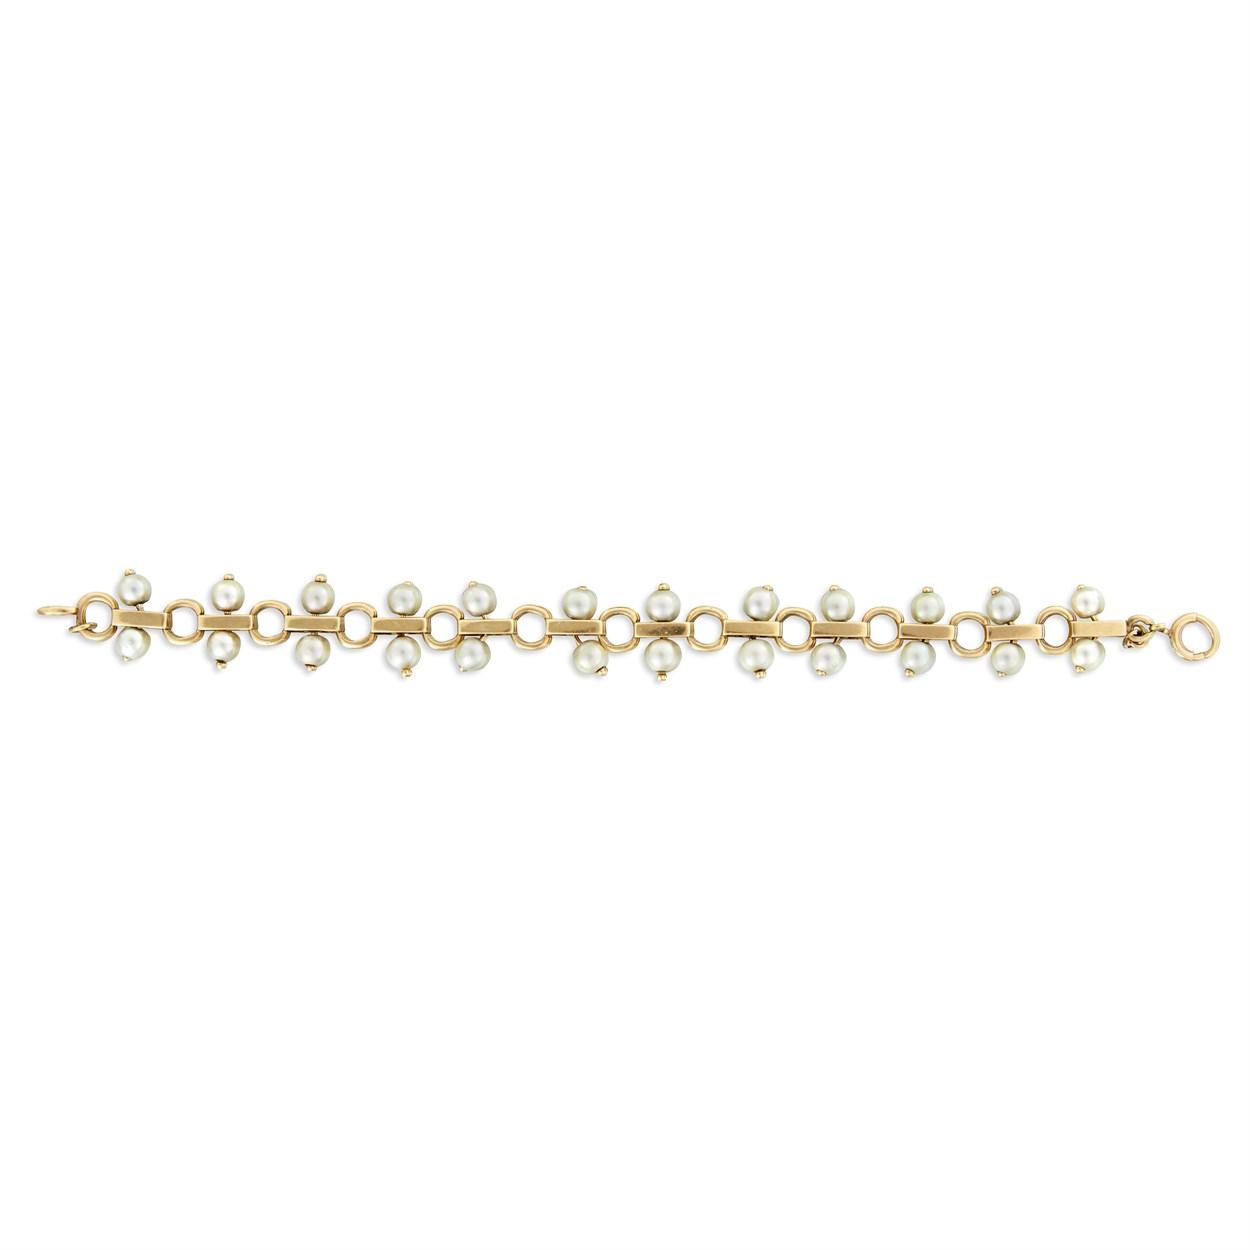 Lot 7 - A fourteen karat gold and cultured pearl bracelet, Tiffany & Co.